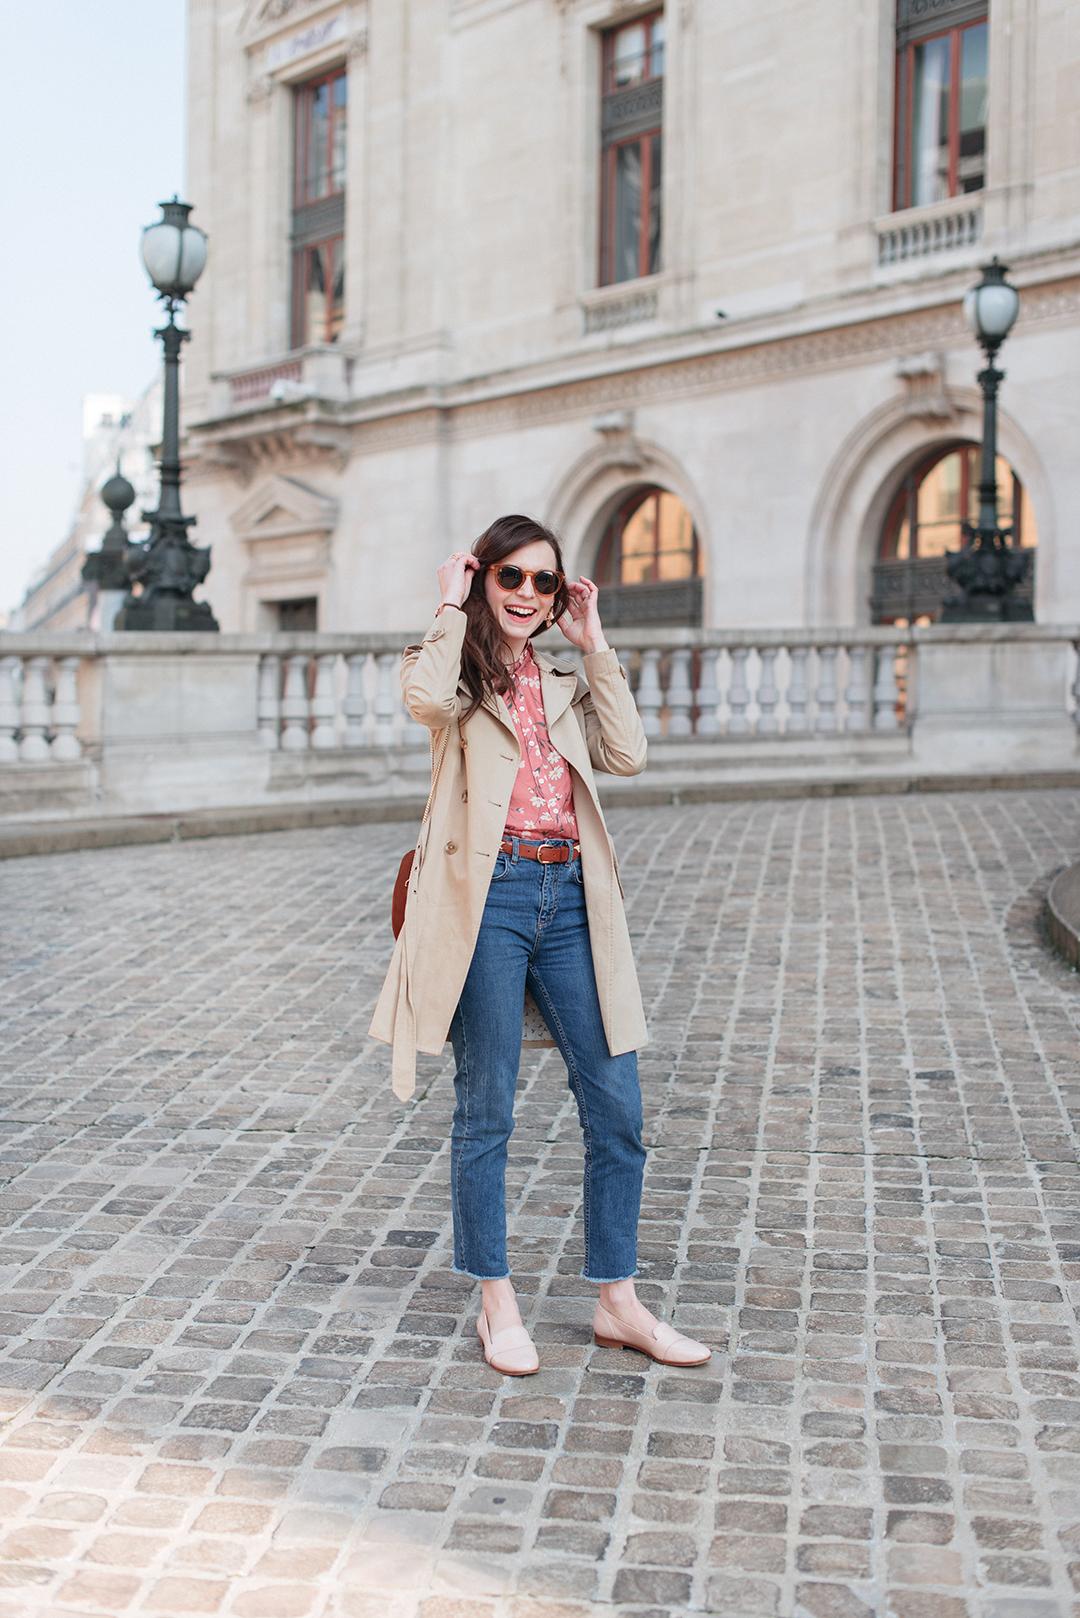 Blog-mode-And-The-City-Lifestyle-Looks-Chemisier-Fleurs-Palais-Garnier-6